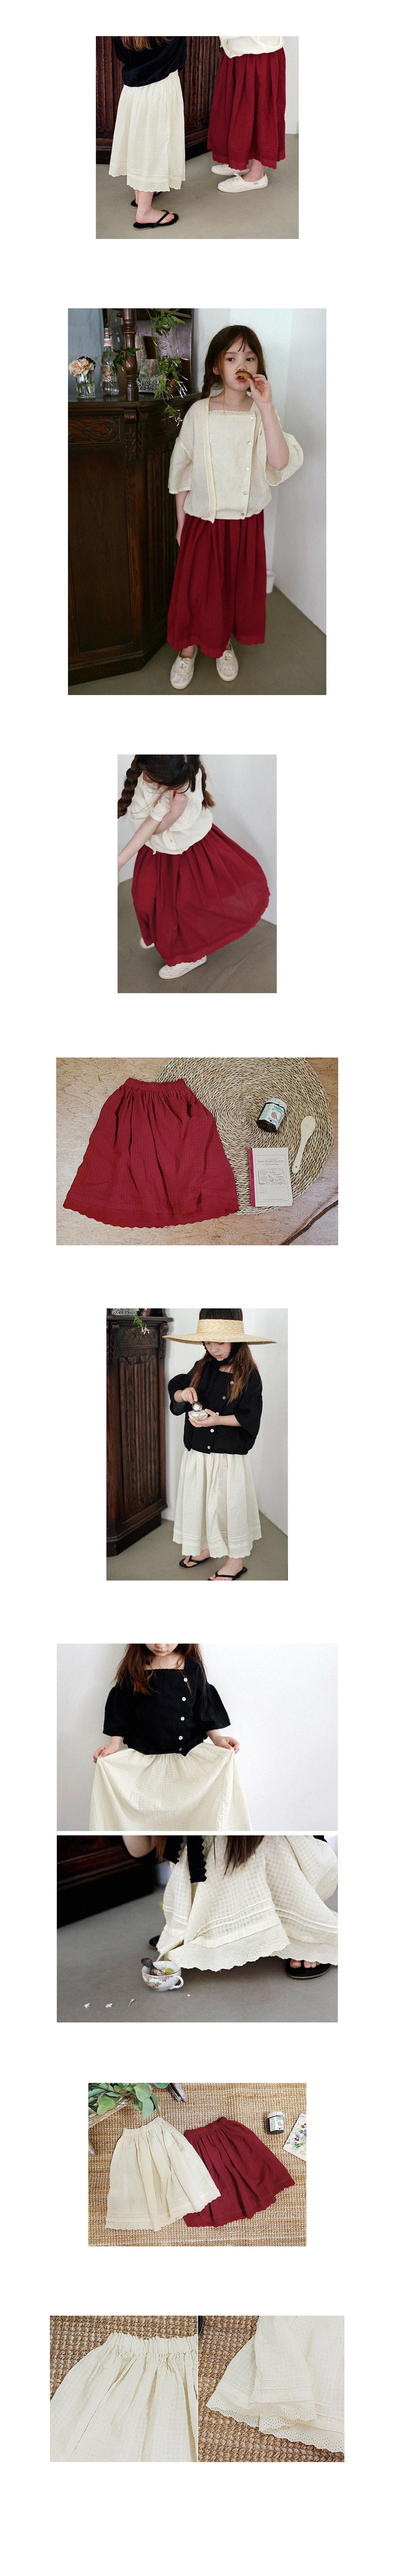 SCON - Korean Children Fashion - #Kfashion4kids - Leubene Skirt - 2